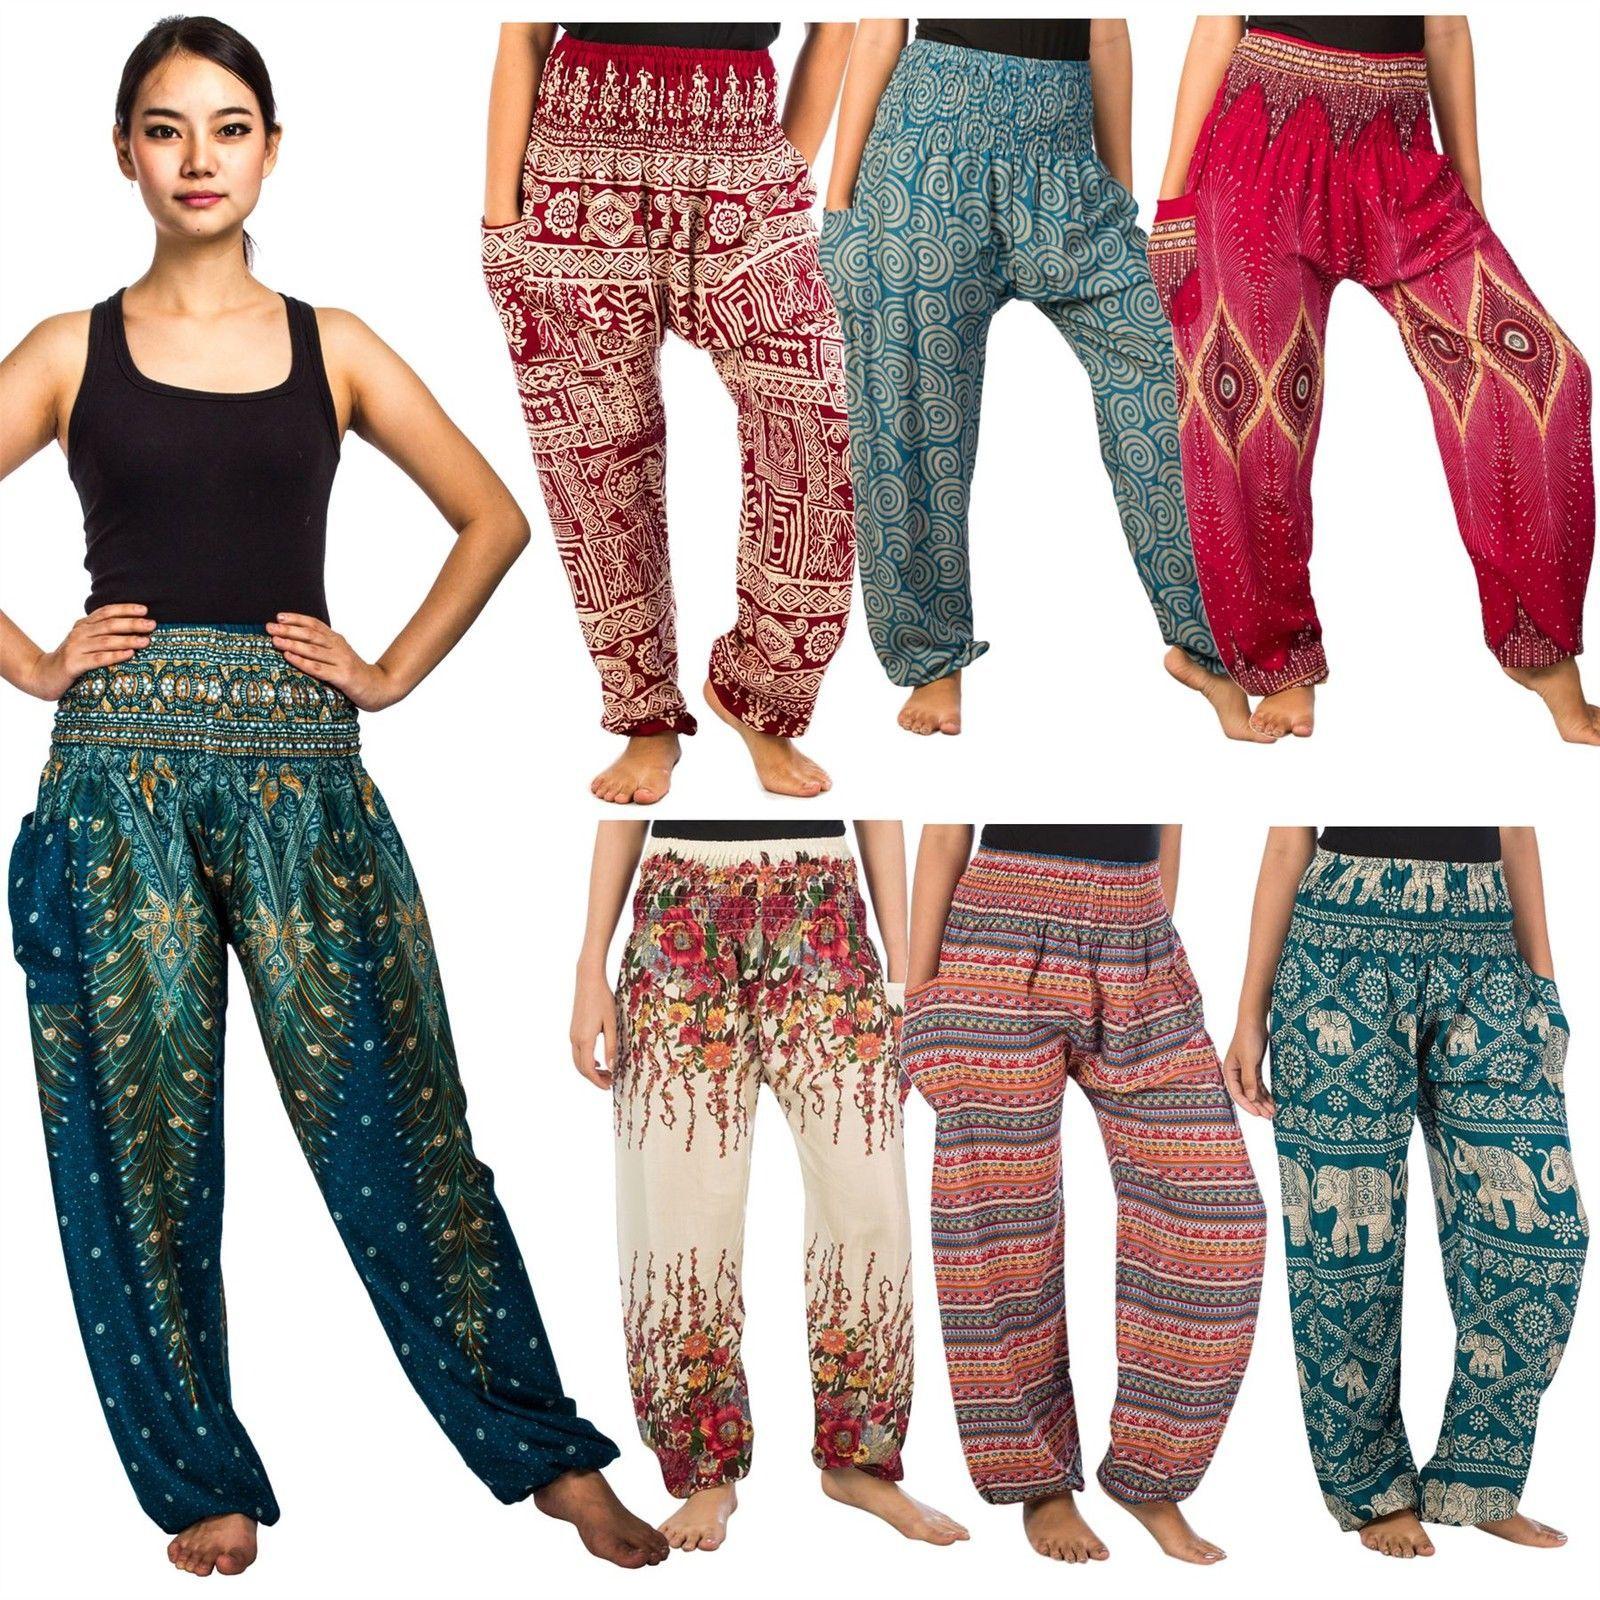 6c600f60436 Thai Flowy Comfy Yoga Beach Baggy Boho Gypsy Hippie Women Harem Pants  Trousers